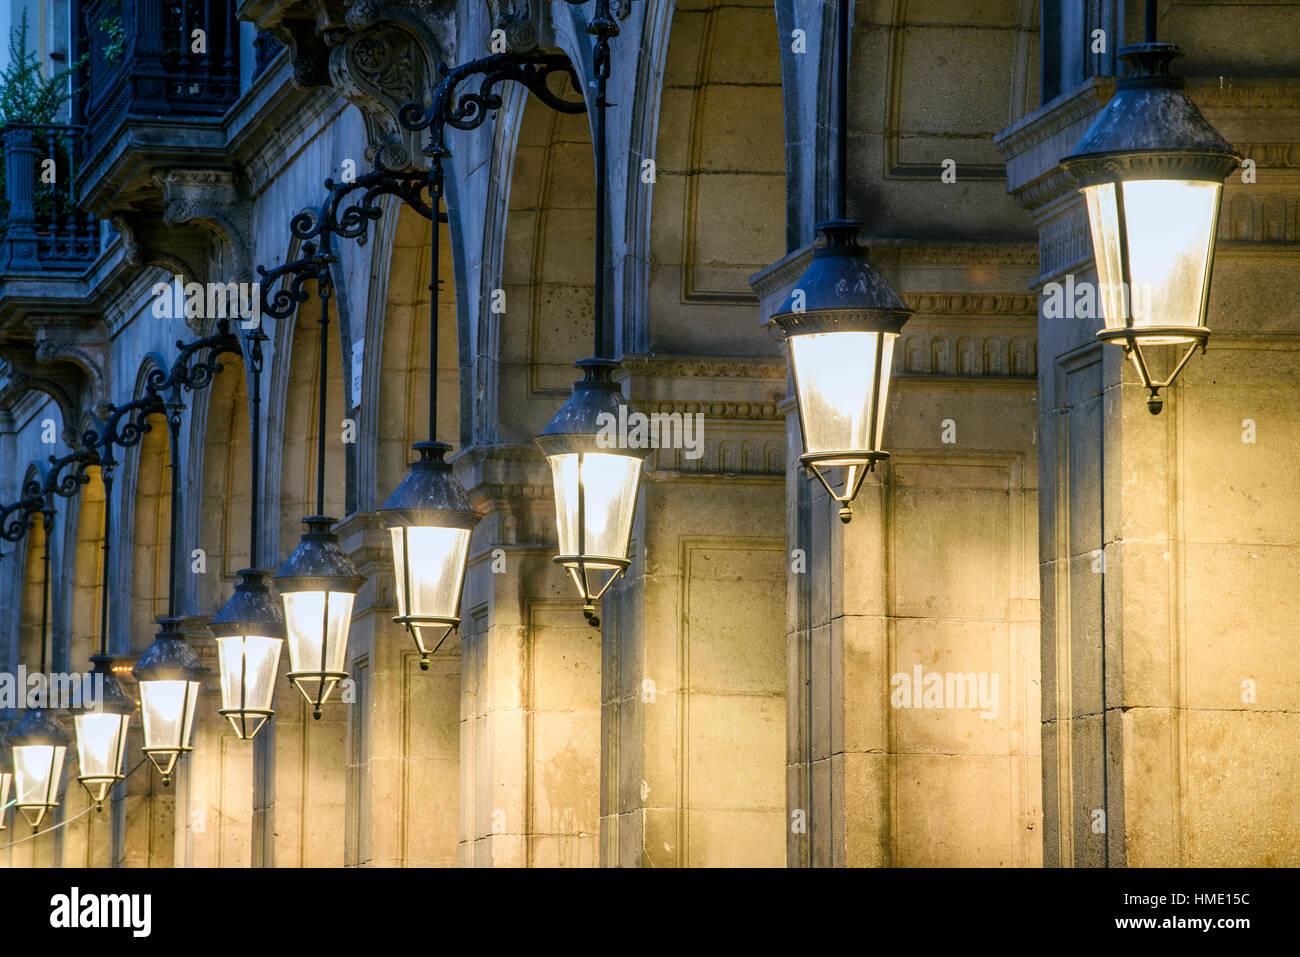 Plaza Real oder Placa Reial bei Nacht, Barcelona, Katalonien, Spanien Stockbild